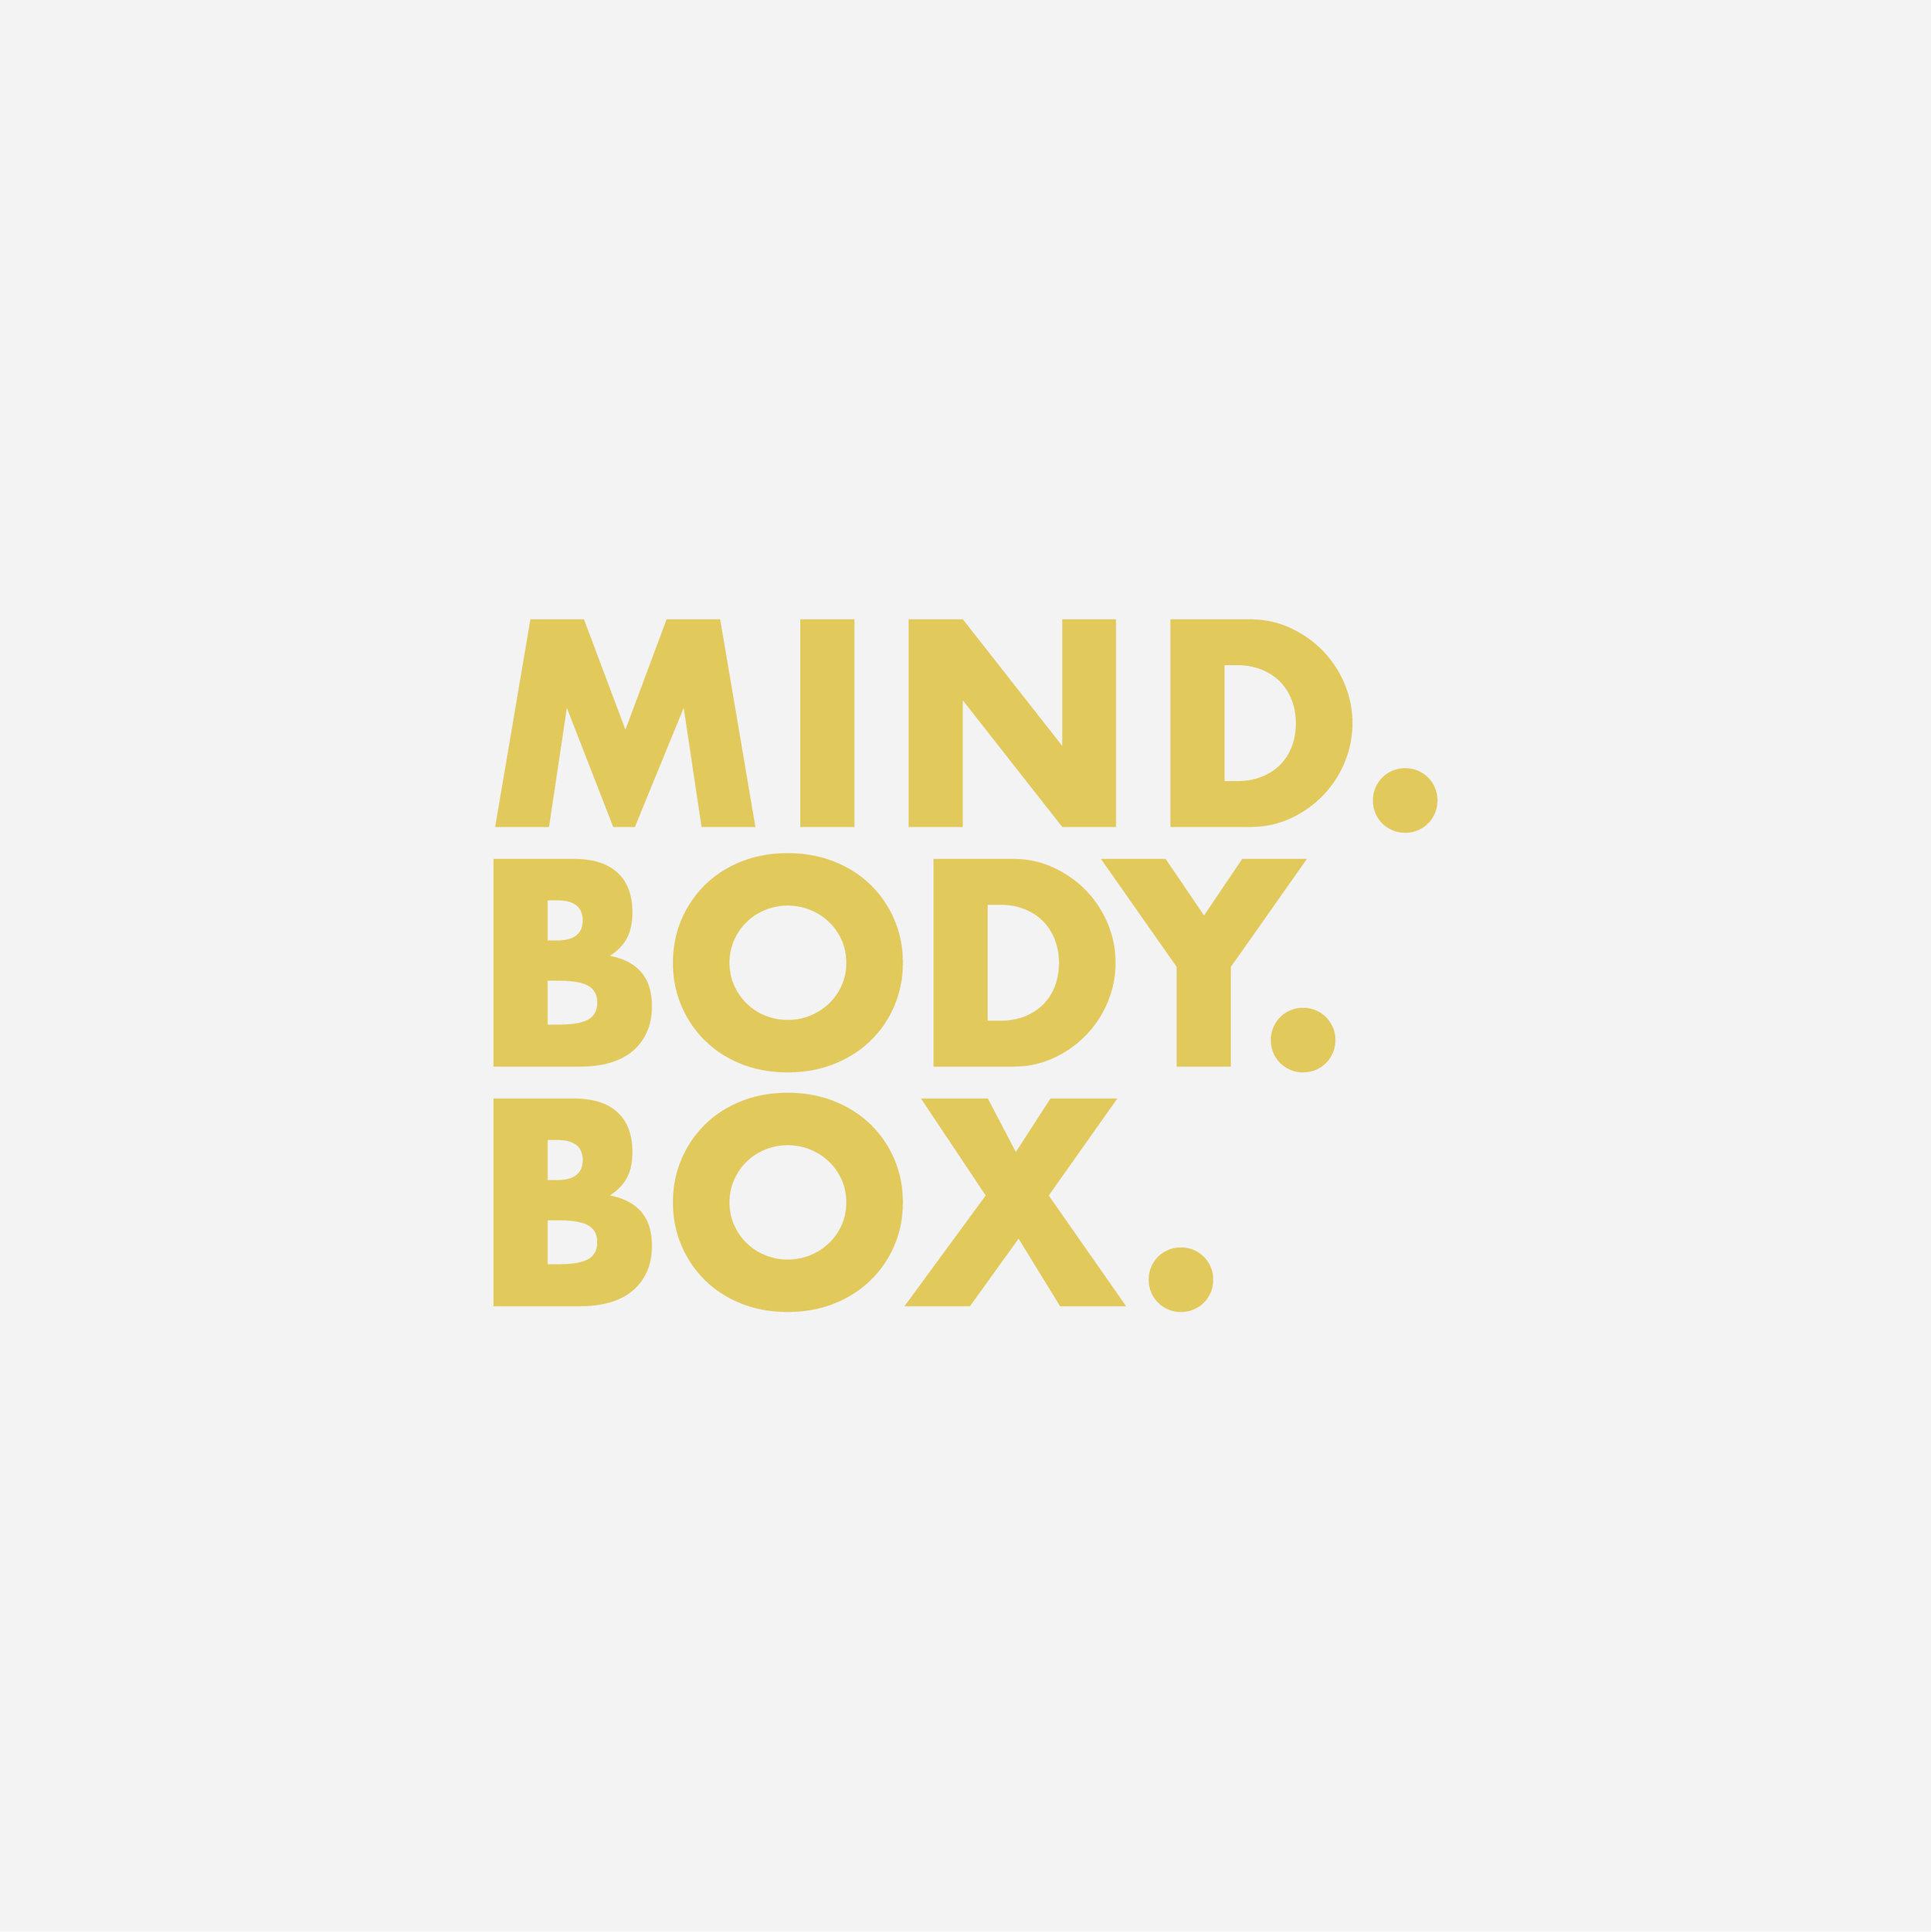 MindBodyBox-01.jpg